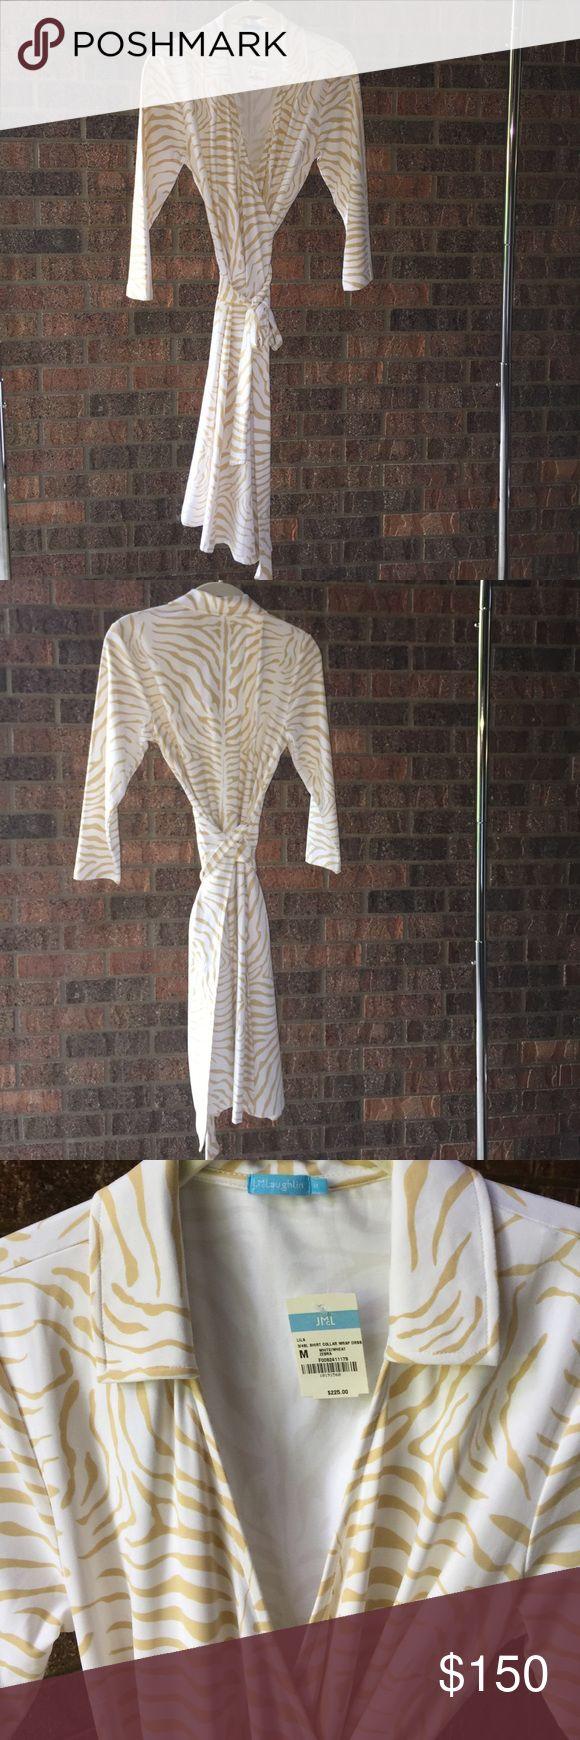 J. McLaughlin LILA collar wrap dress J. McLaughlin LILA collar wheat zebra wrap dress. Size M. NEVER BEEN WORN!!! J. McLaughlin Dresses Long Sleeve